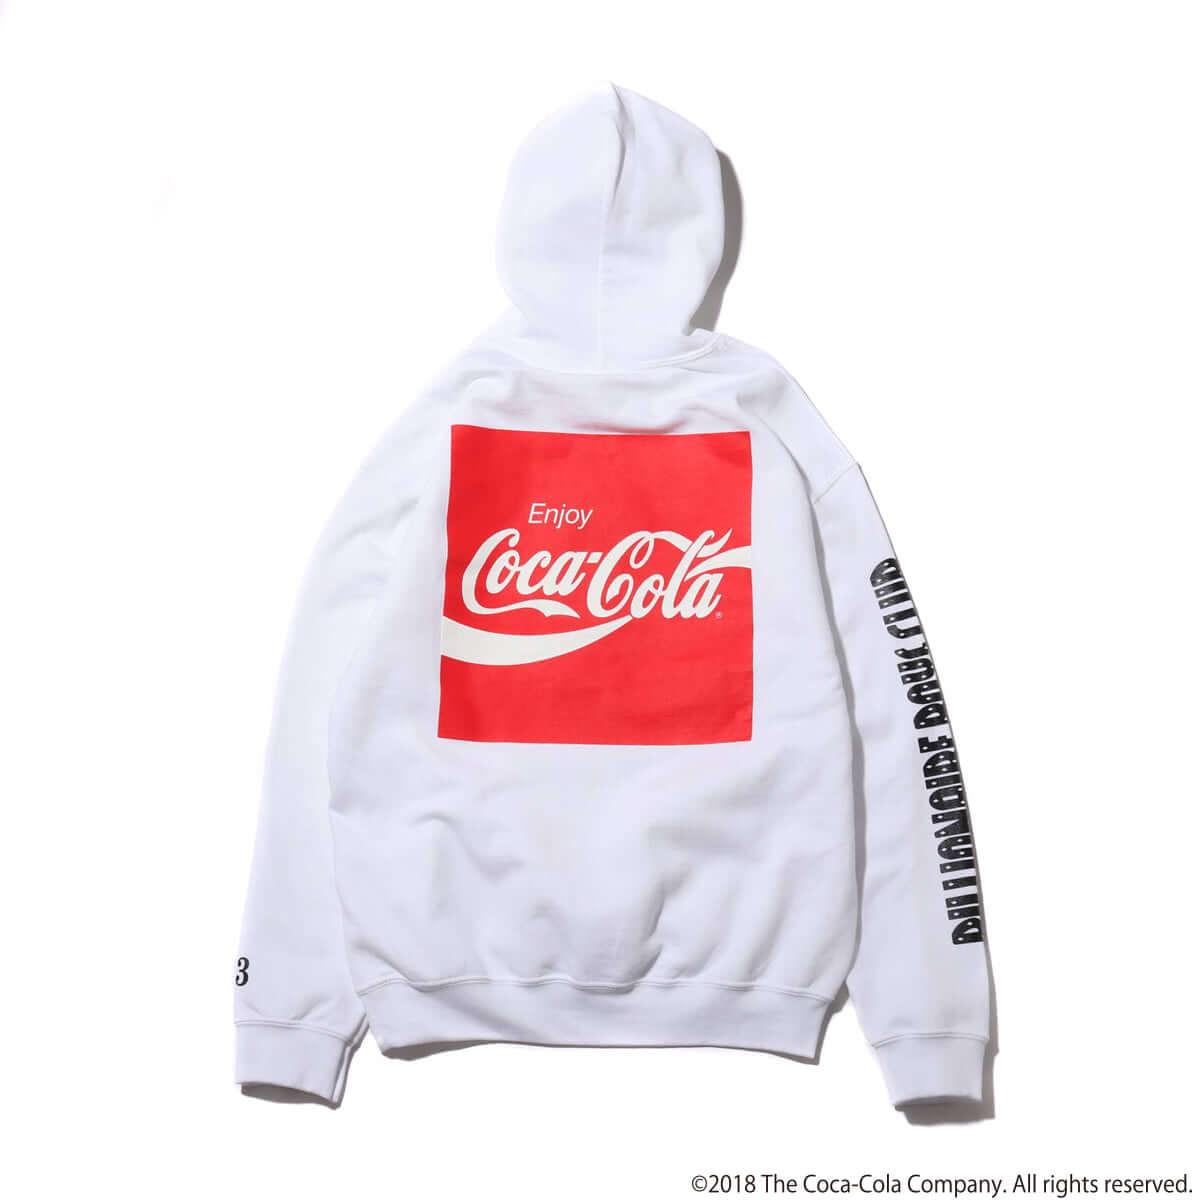 Coca-Cola×Billionaire Boys Club×ATMOS LAB トリプルコラボレーションアイテムが発売 whitehood-4c-1200x1200